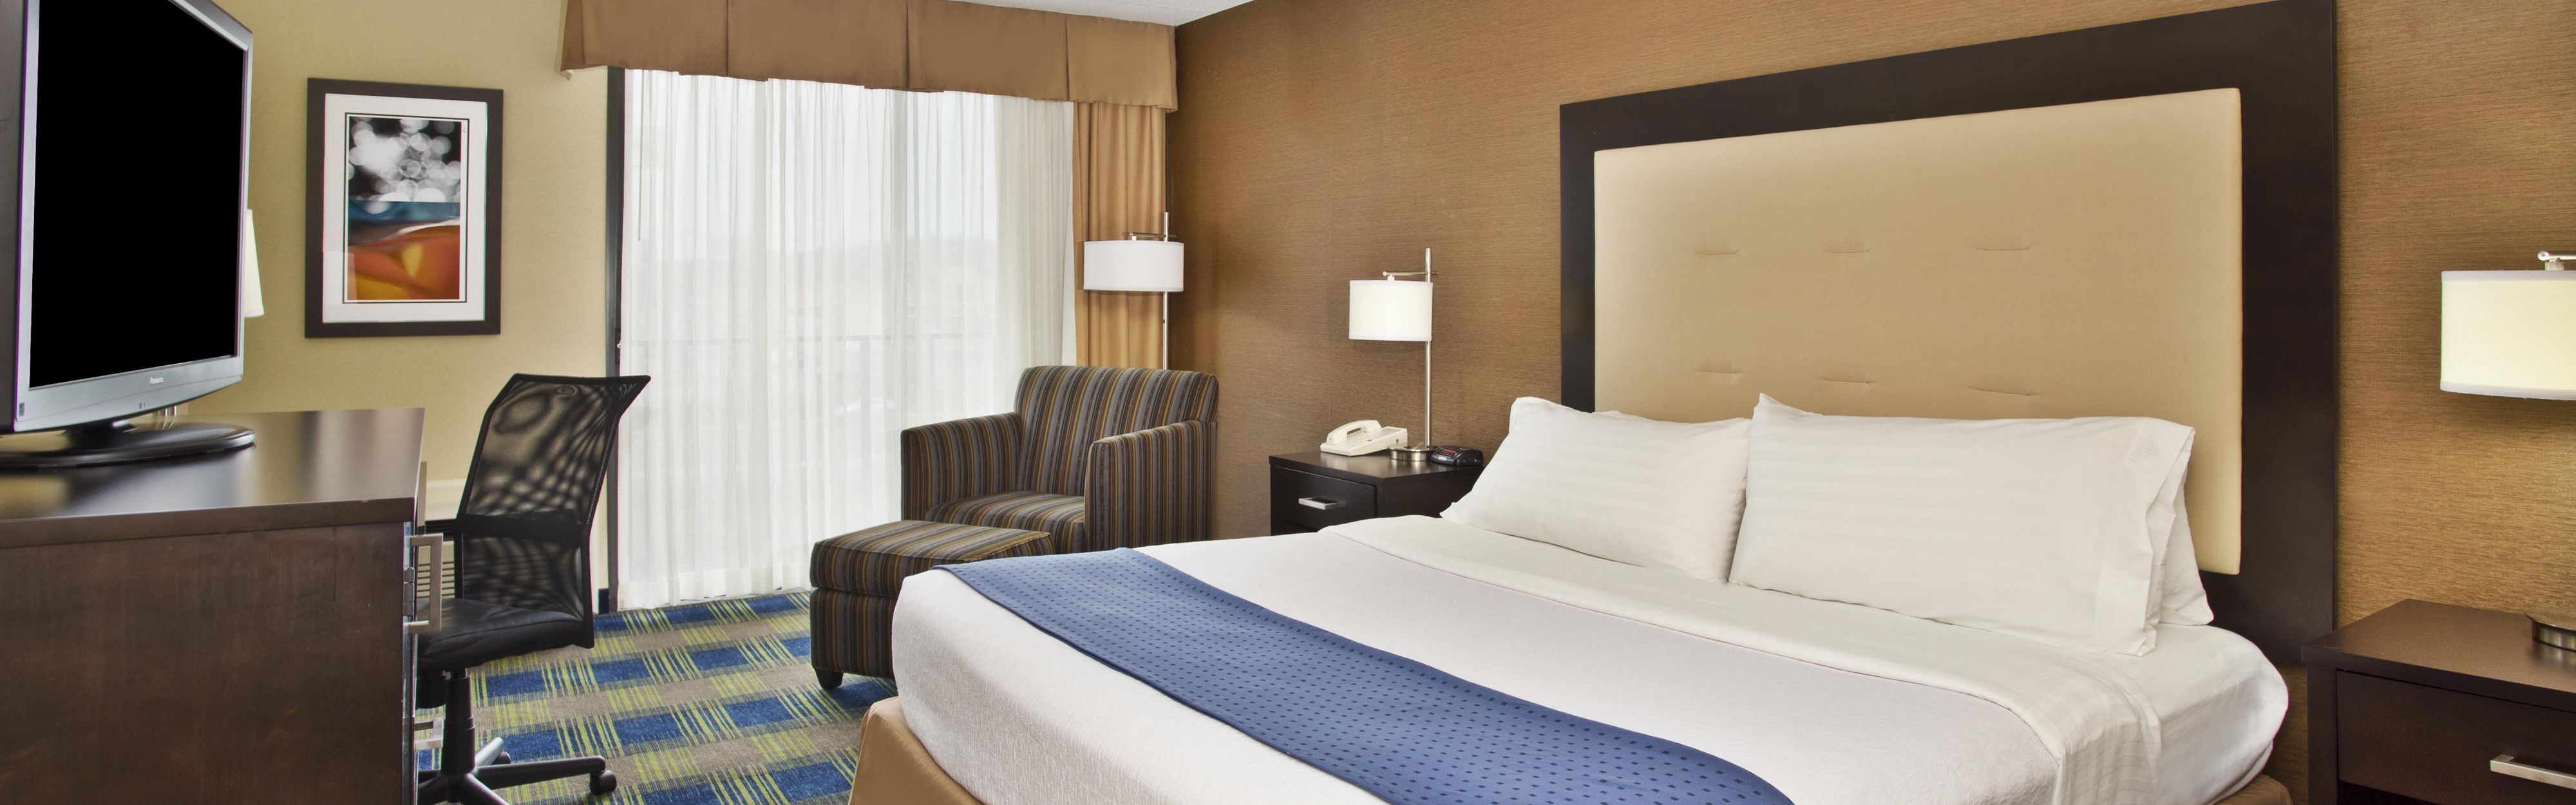 Holiday Inn Akron West - Fairlawn image 1